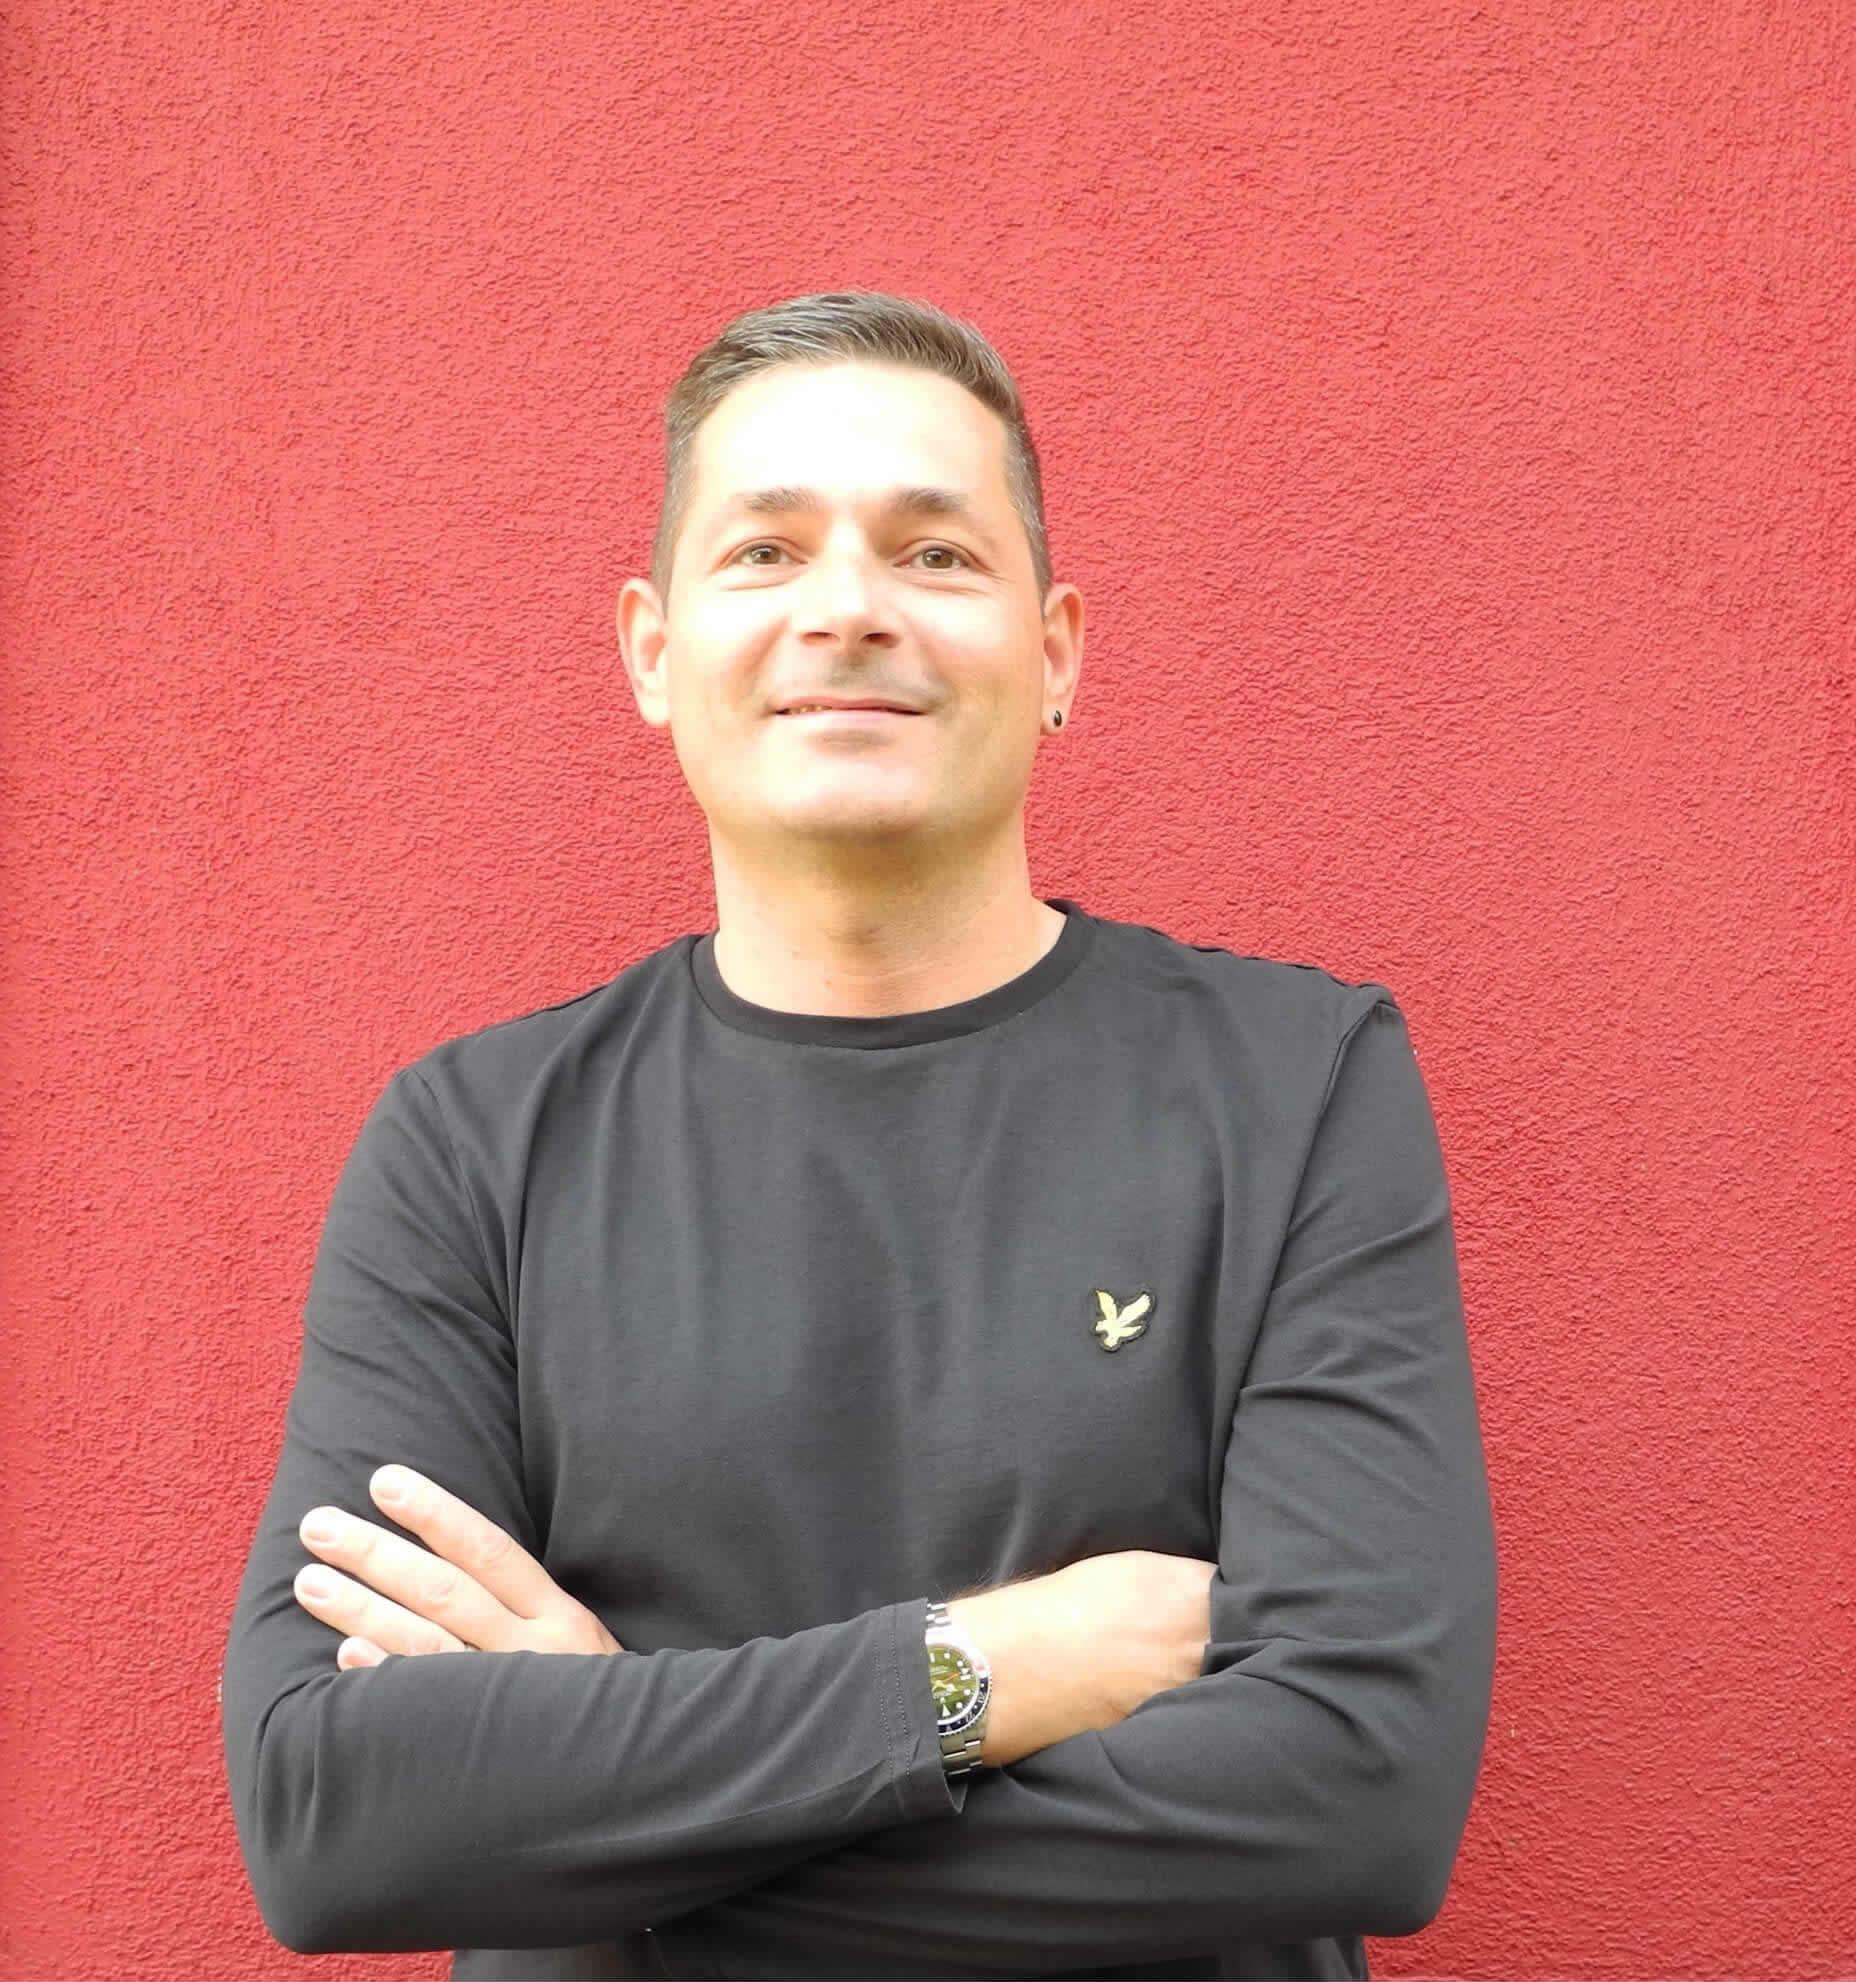 Bernd Brändle